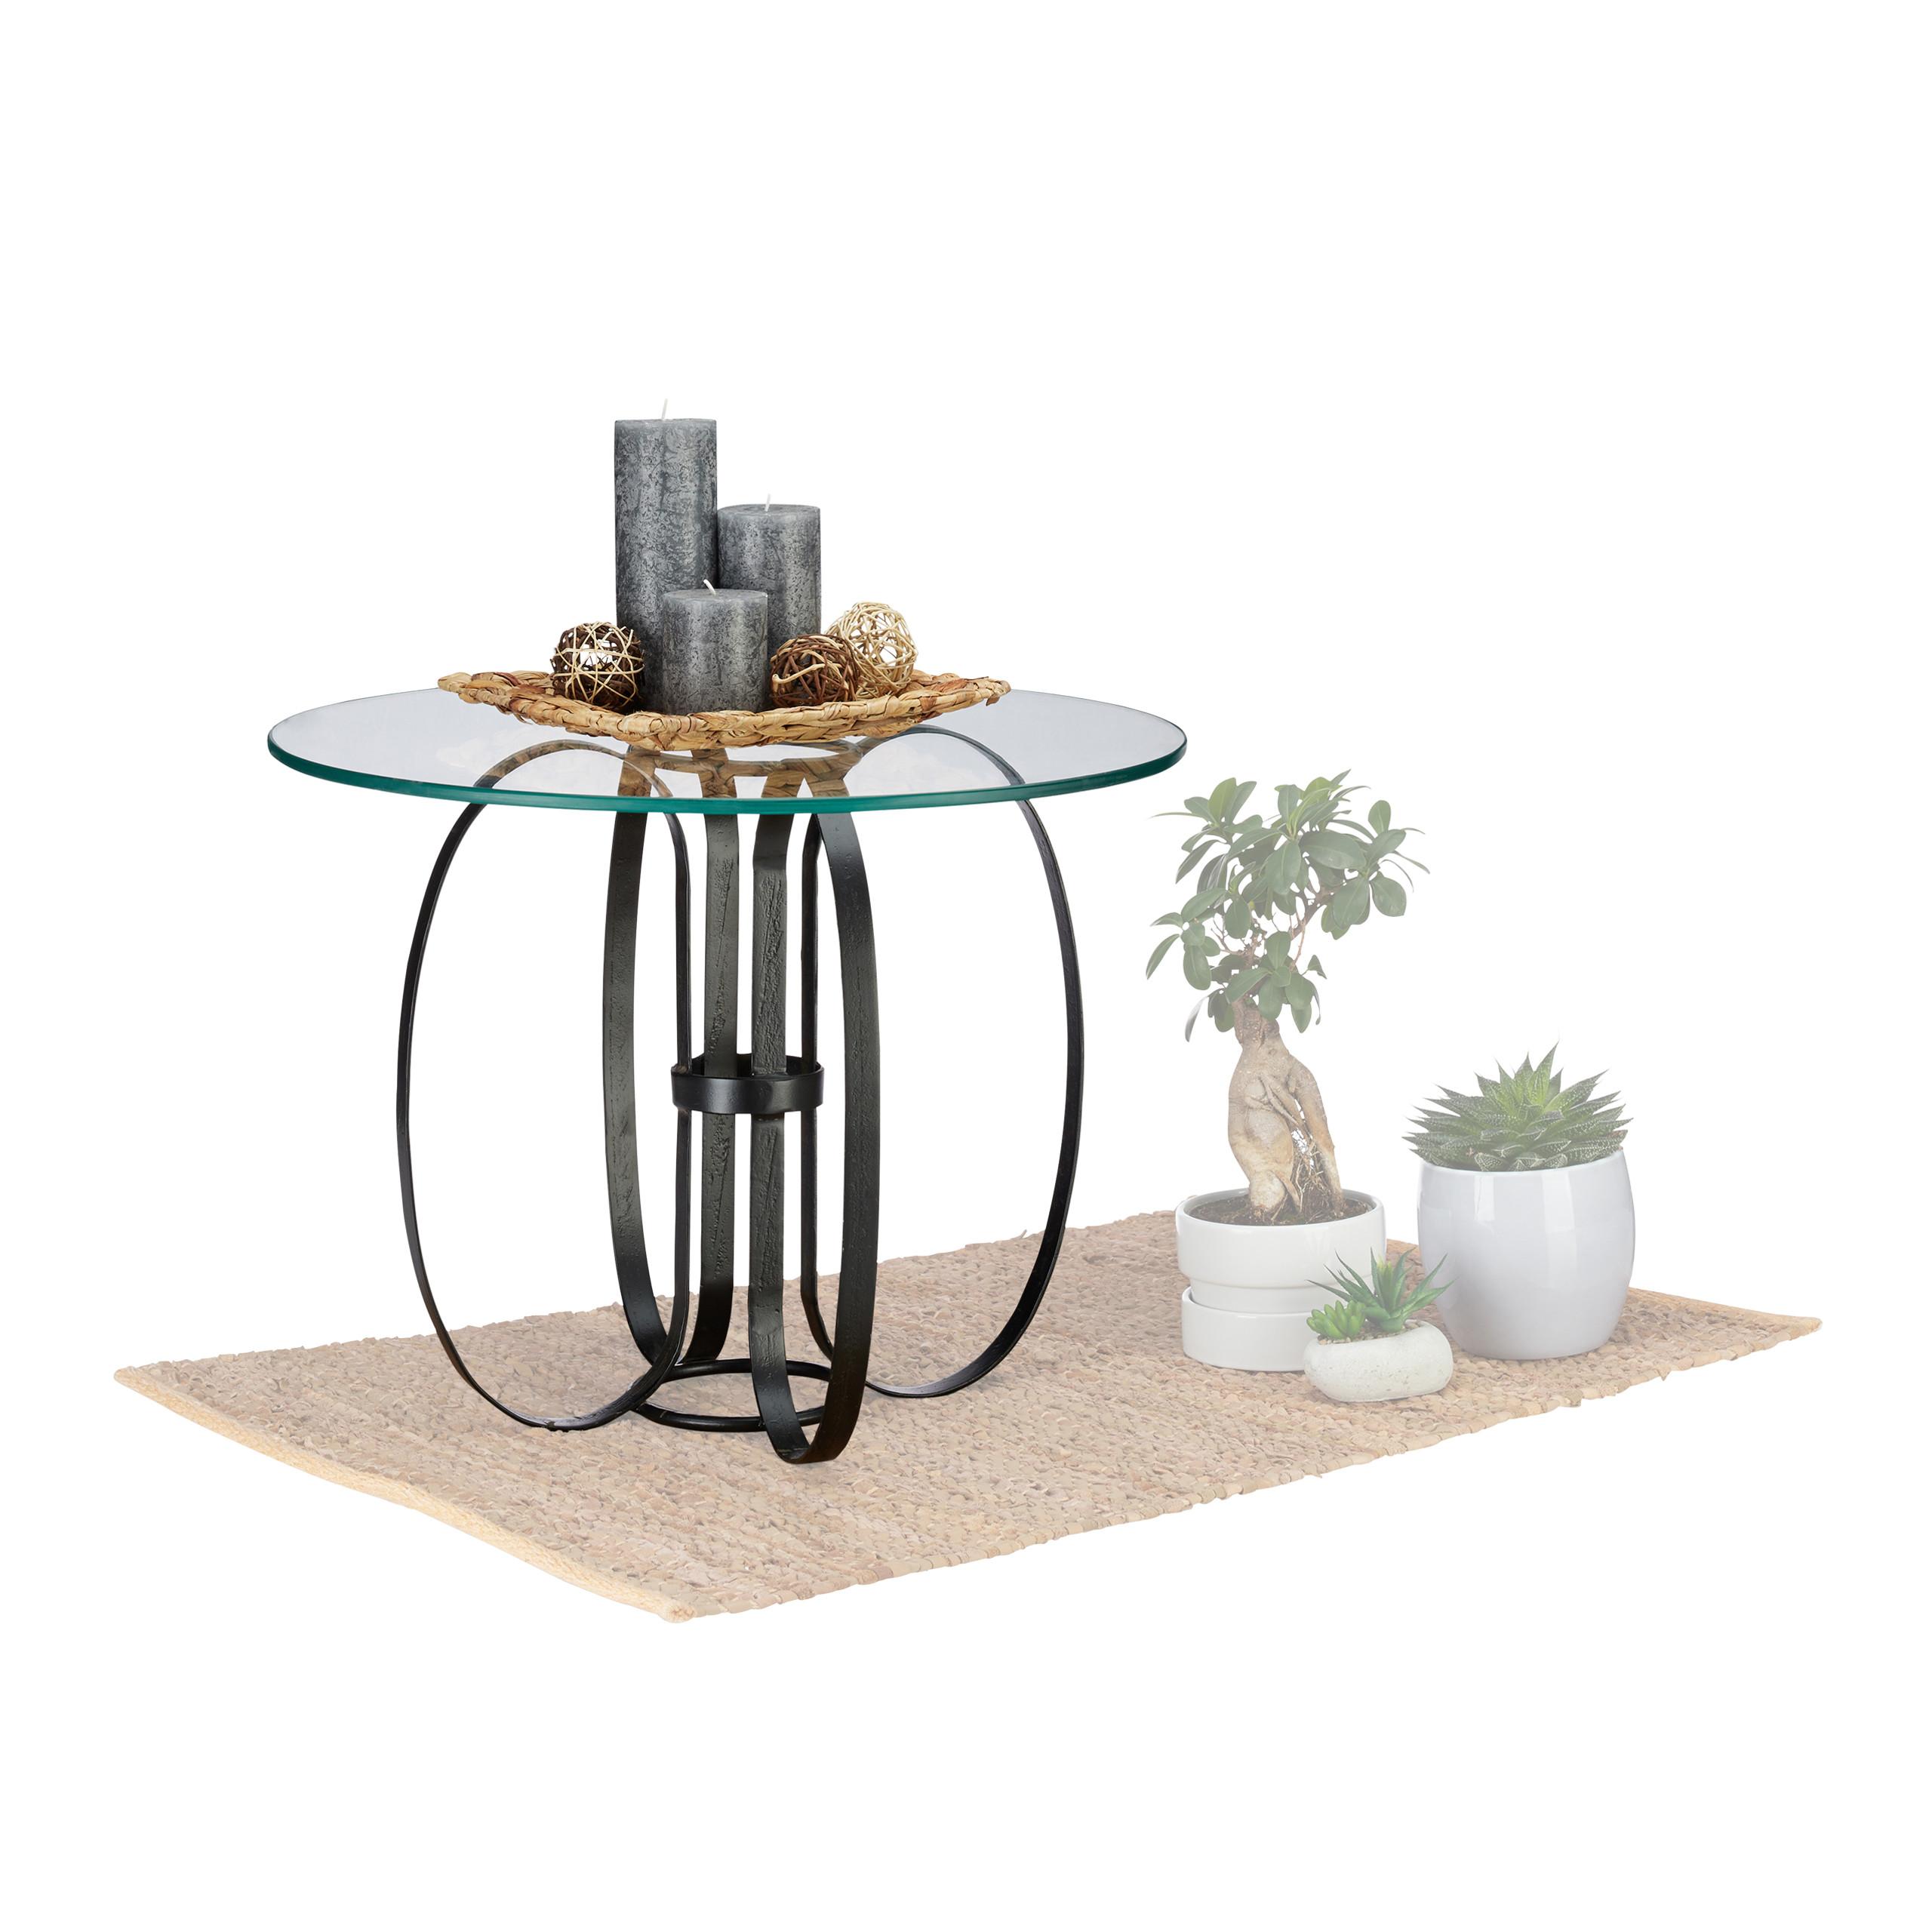 Table d'appoint ronde verre métal, table salon moderne table basse design |  eBay